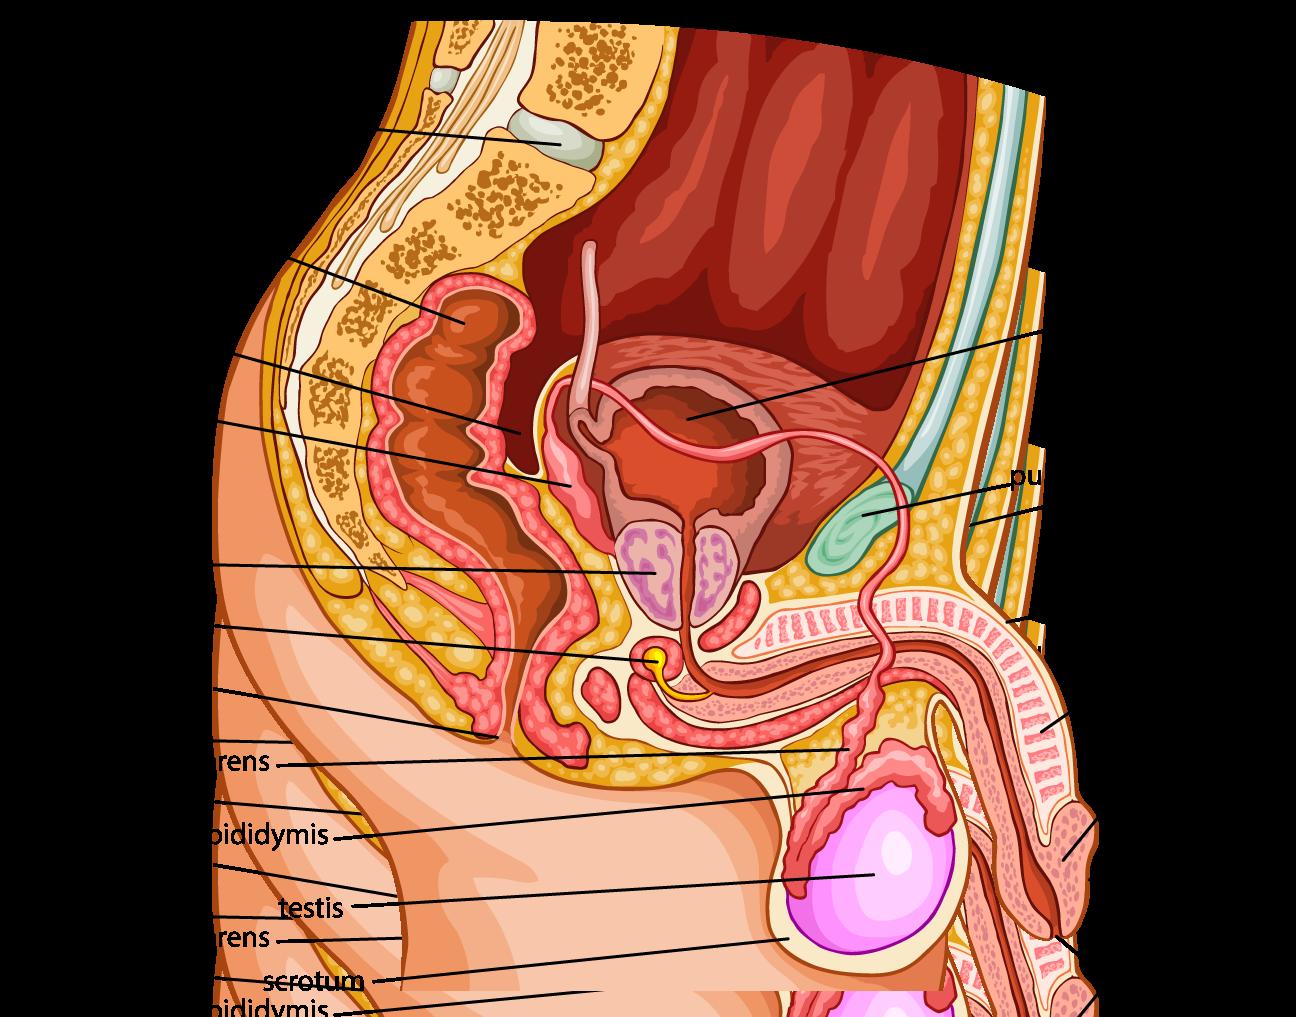 Bio 25 01 male reproductive parts urology male pinterest bio 25 01 male reproductive parts pooptronica Choice Image